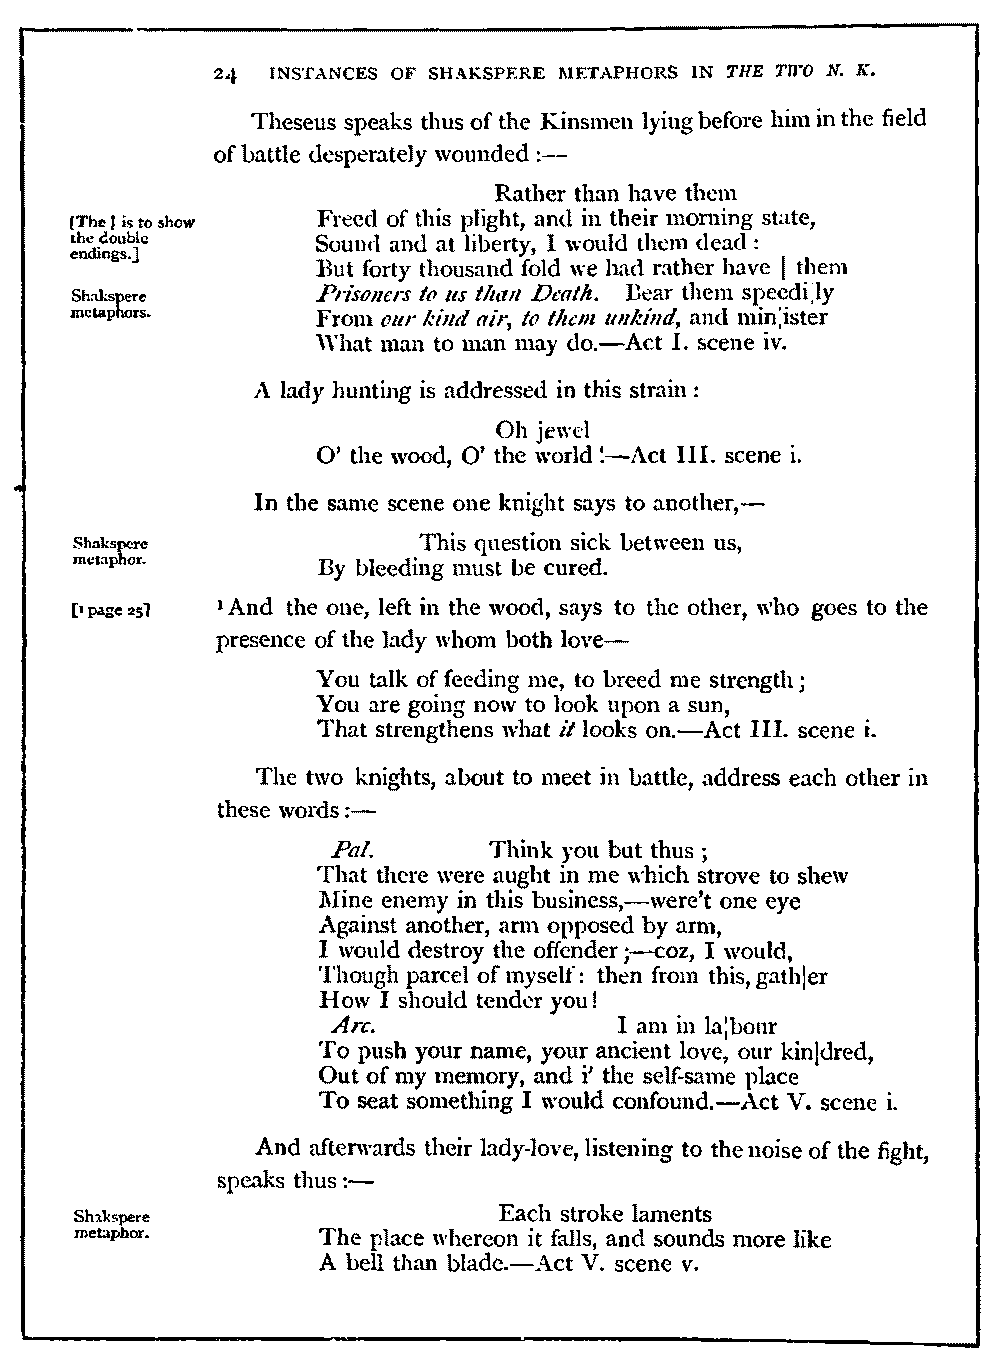 The Project Gutenberg eBook of A Letter on Shakspere's